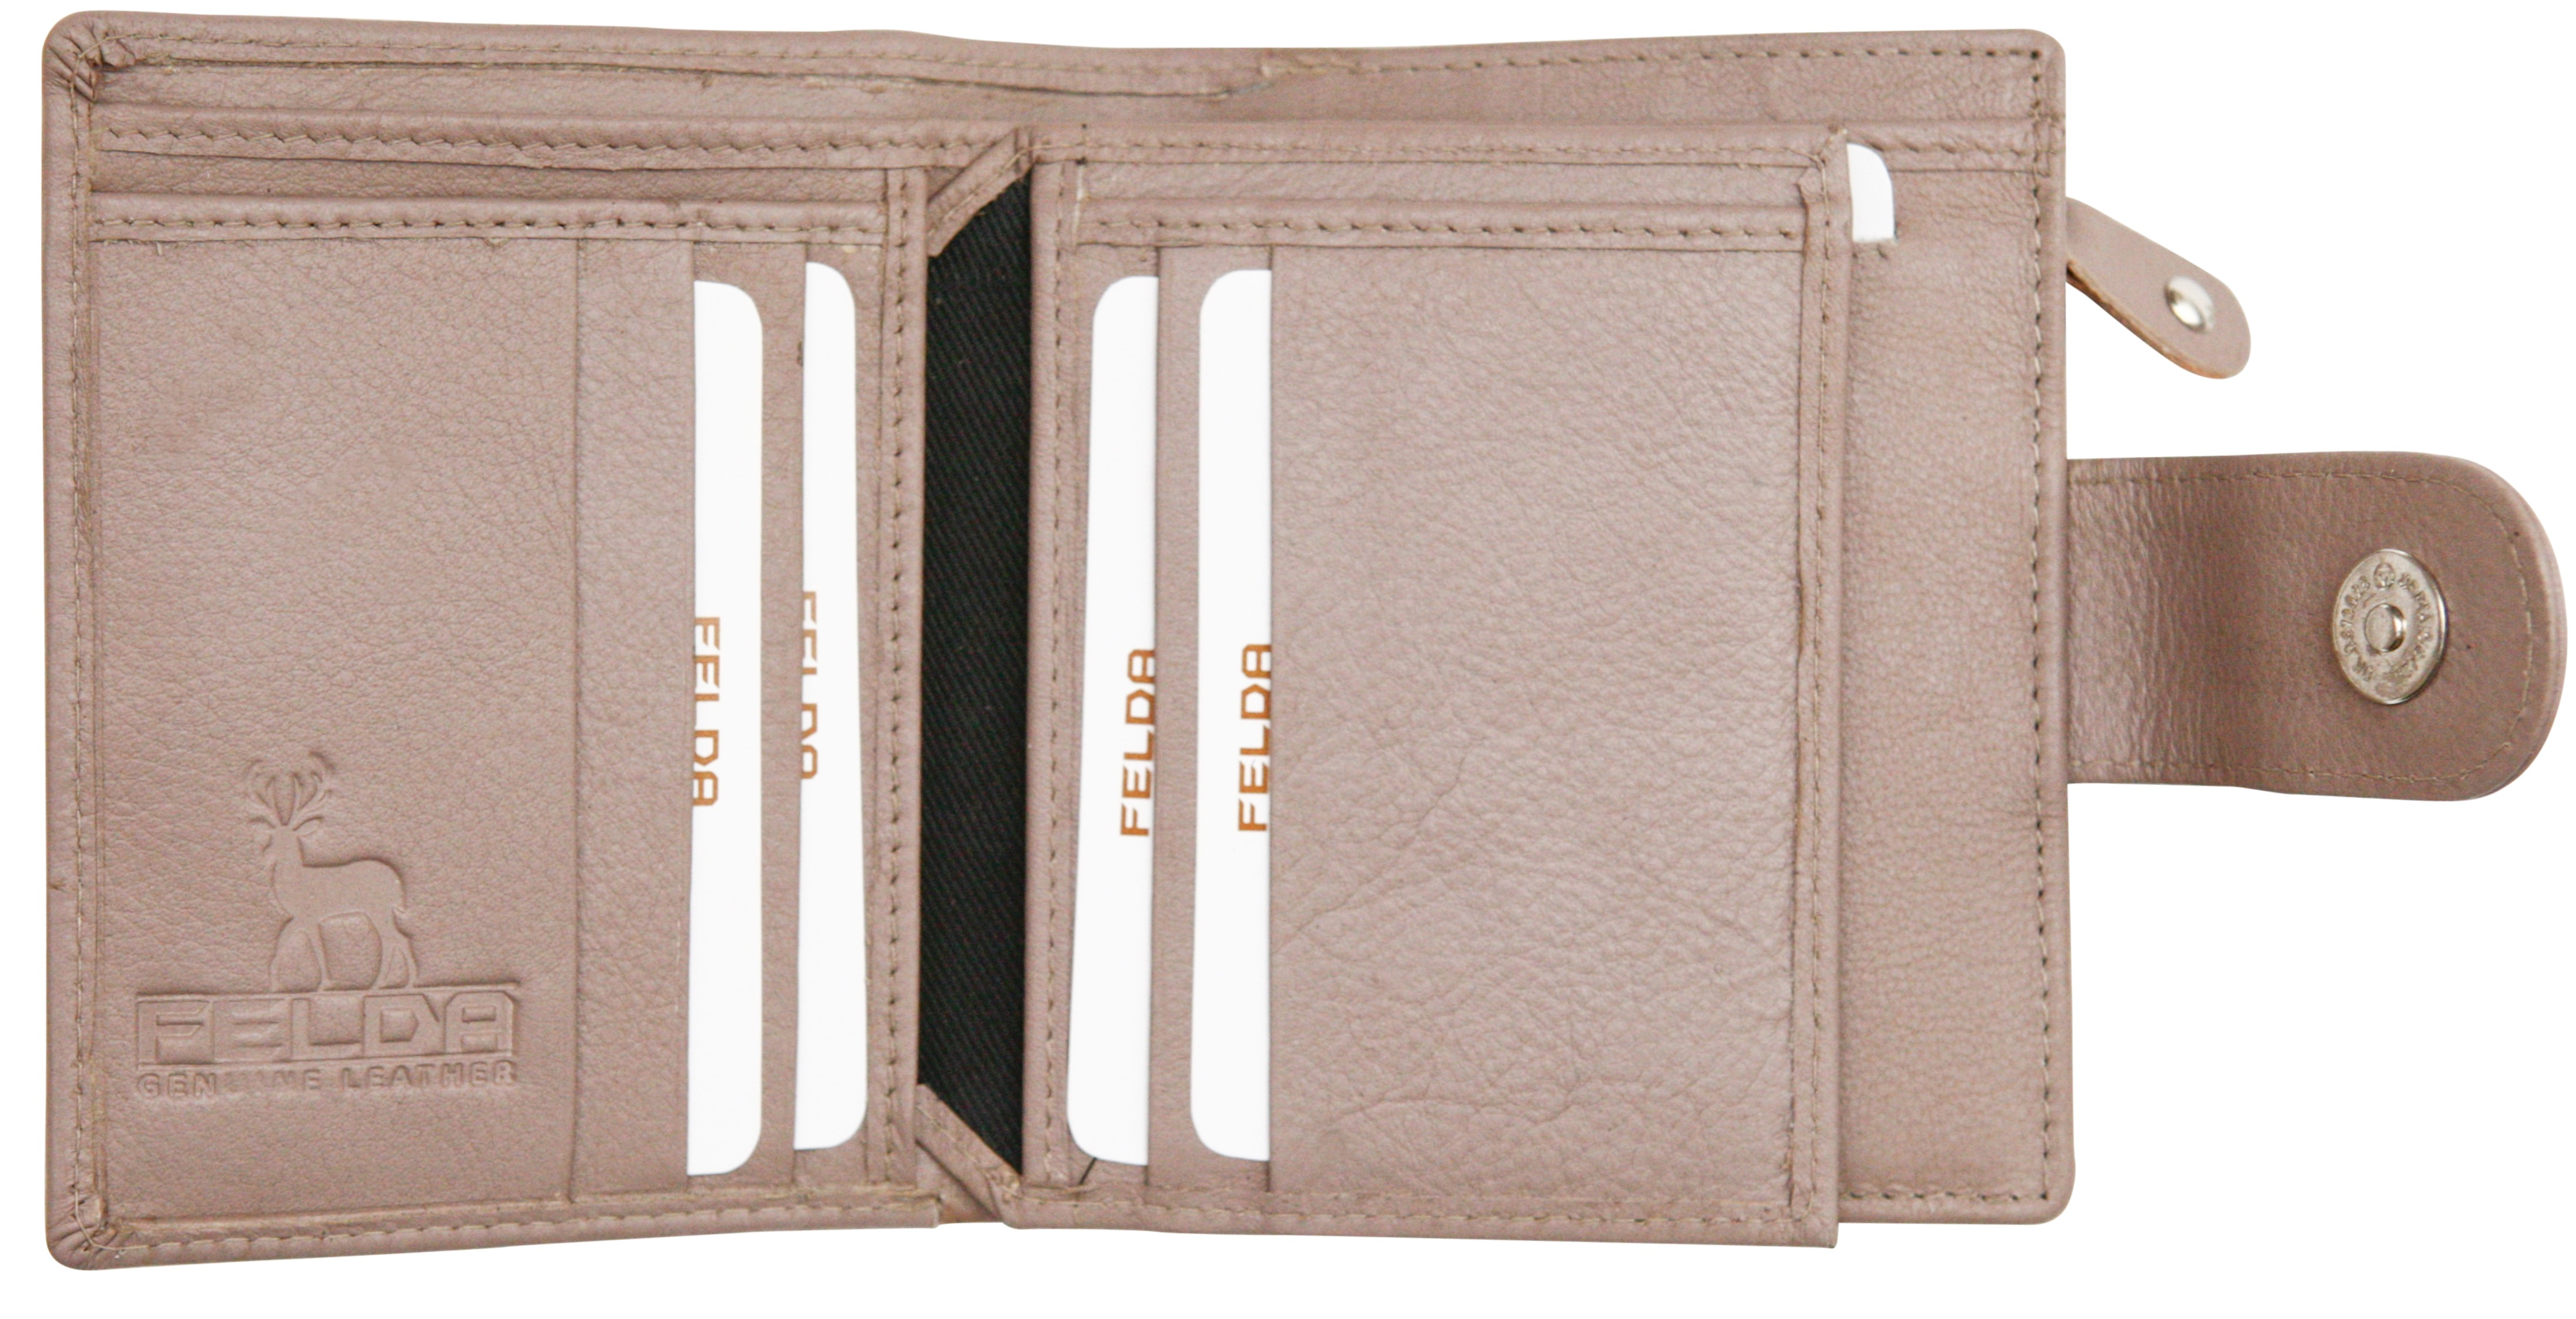 Felda-RFID-onorevoli-MEDAGLIA-amp-Card-Purse-Wallet-Genuine-Leather-Multi-SOFT-BOX-REGALO miniatura 78